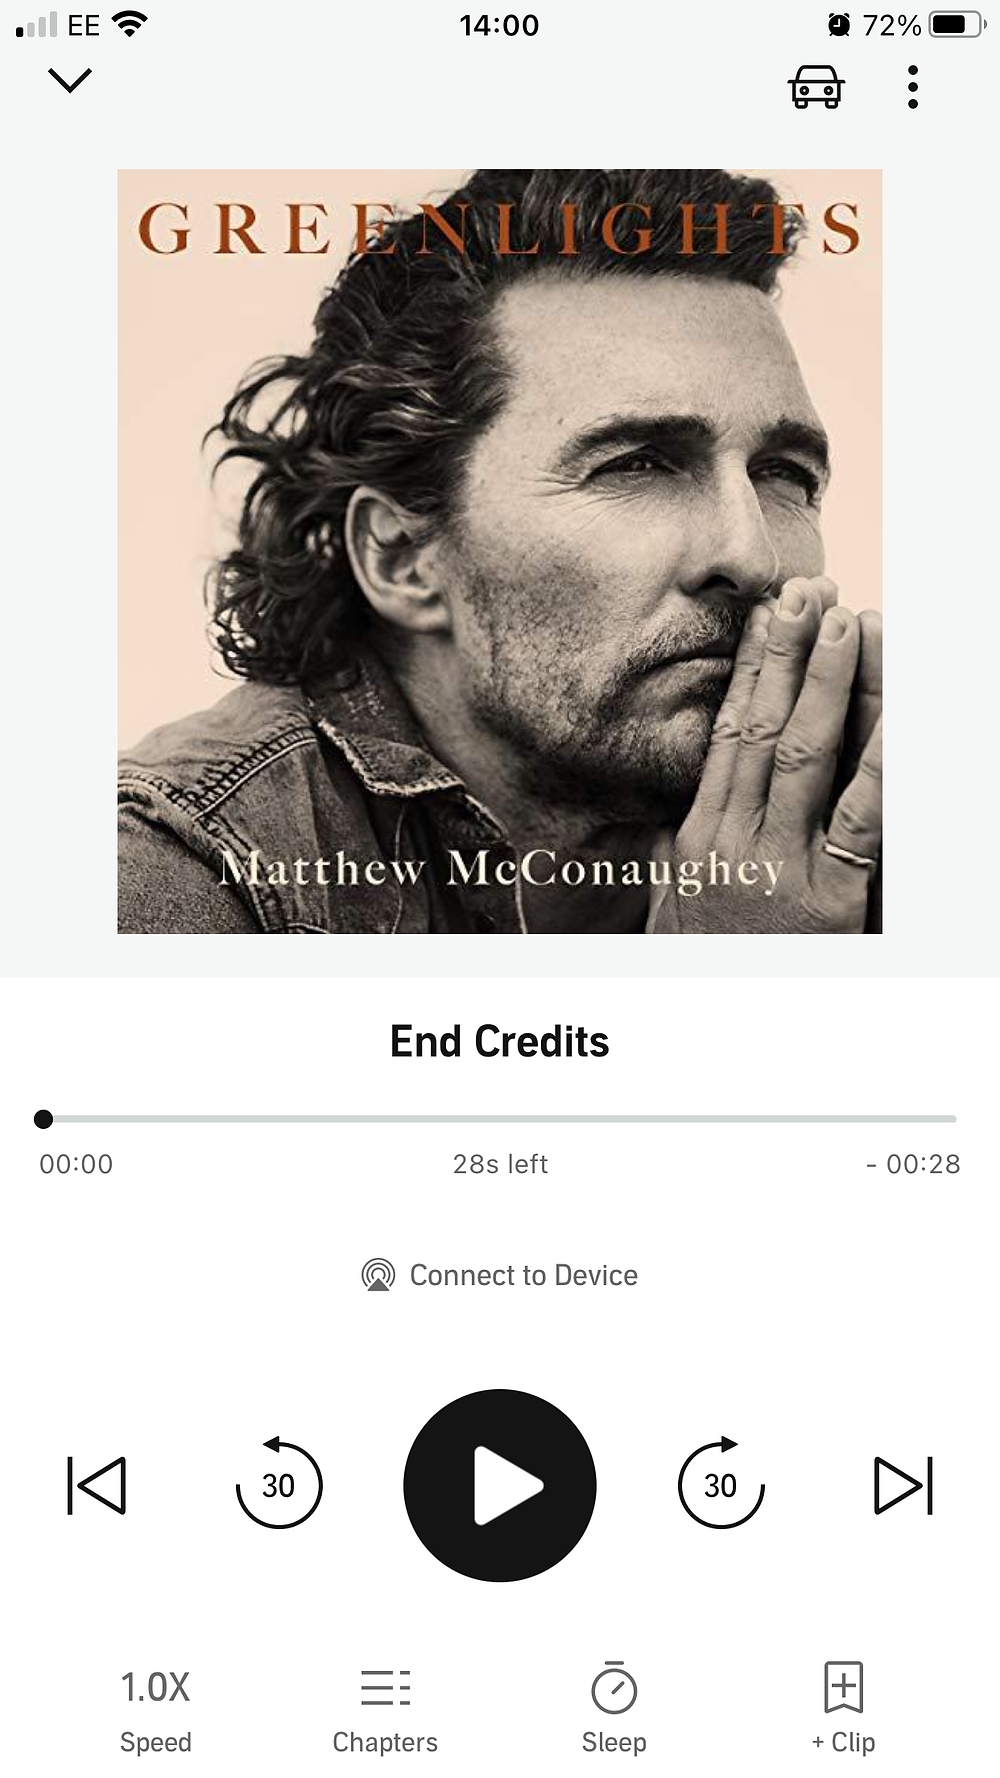 Matthew McConaughey's 'Greenlights'